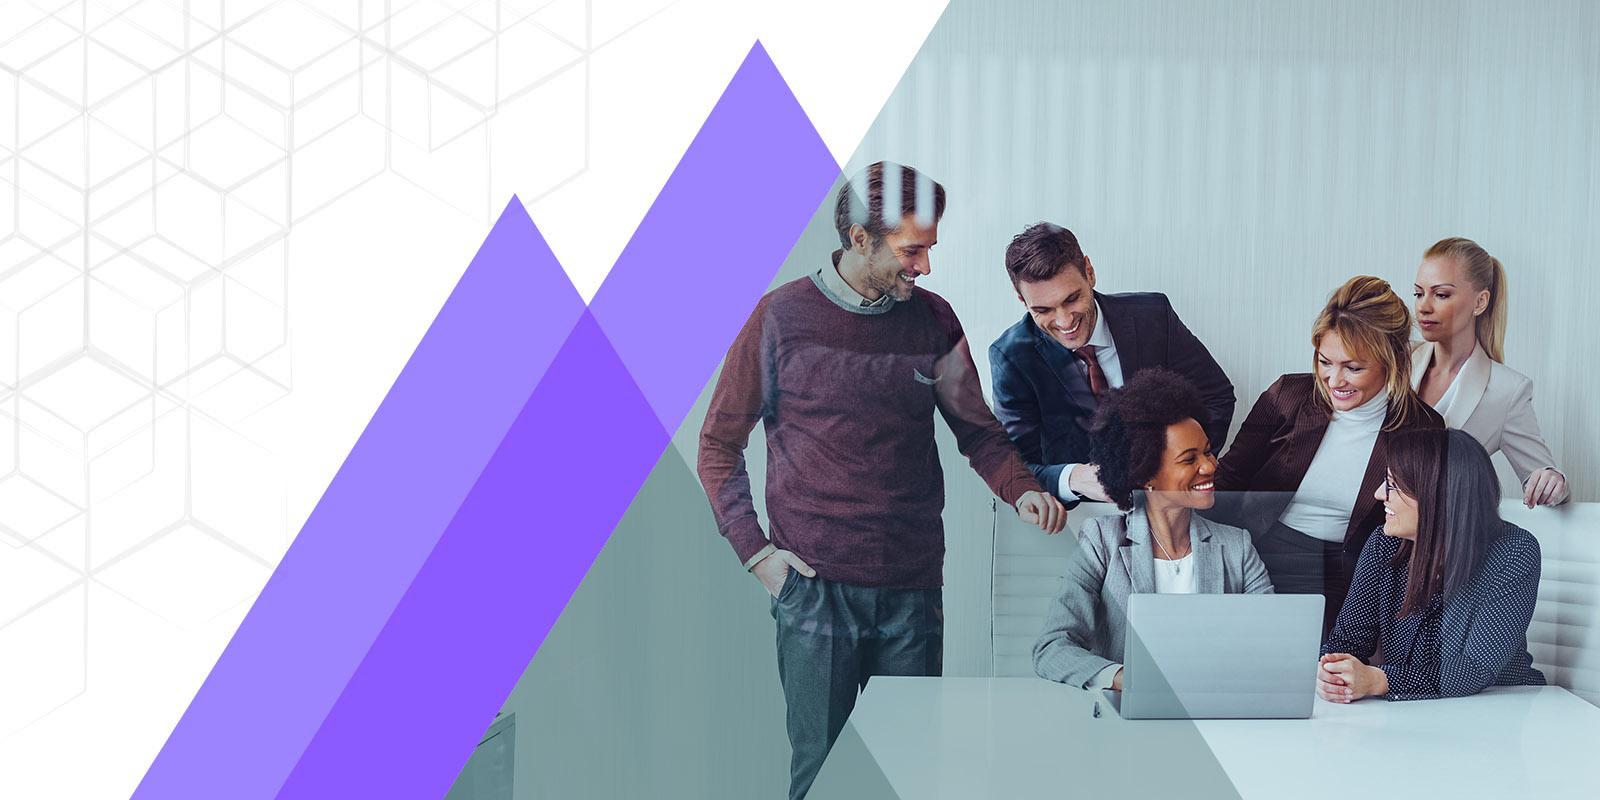 Course Image Team Building & Teamwork